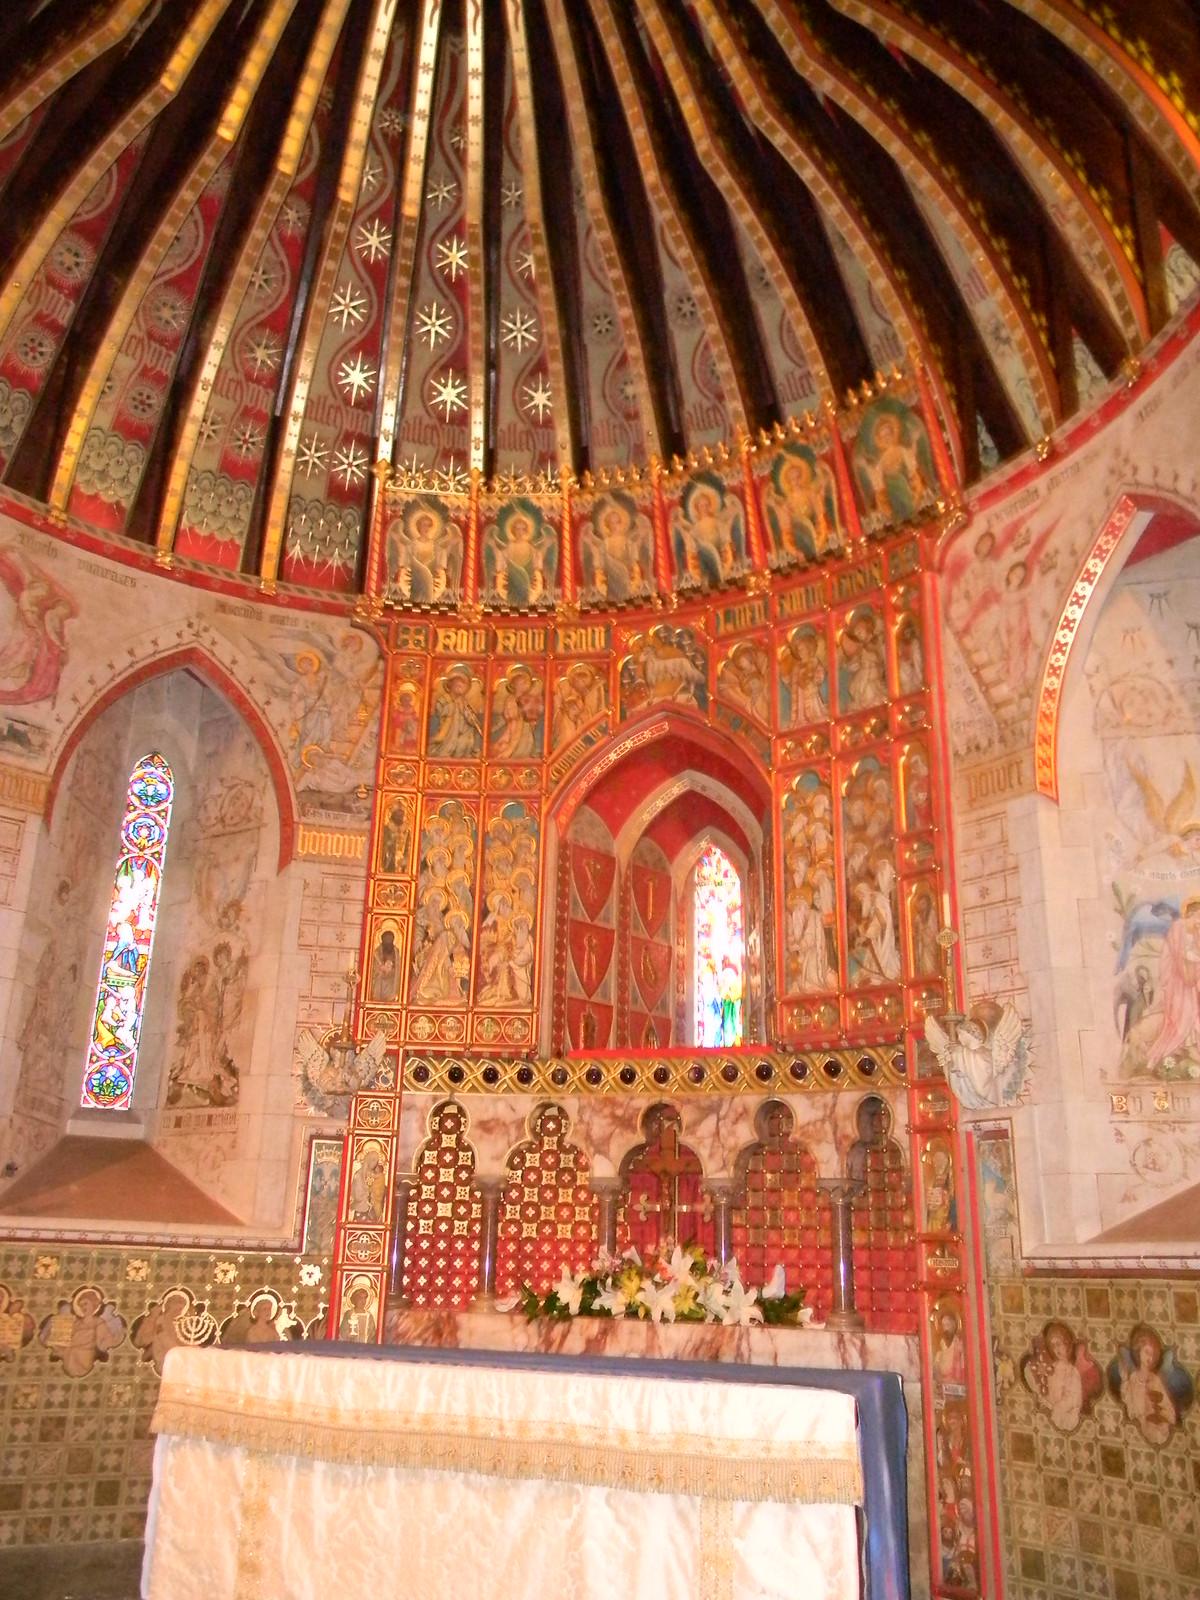 Interior, Hascombe Church Milford to Godalming